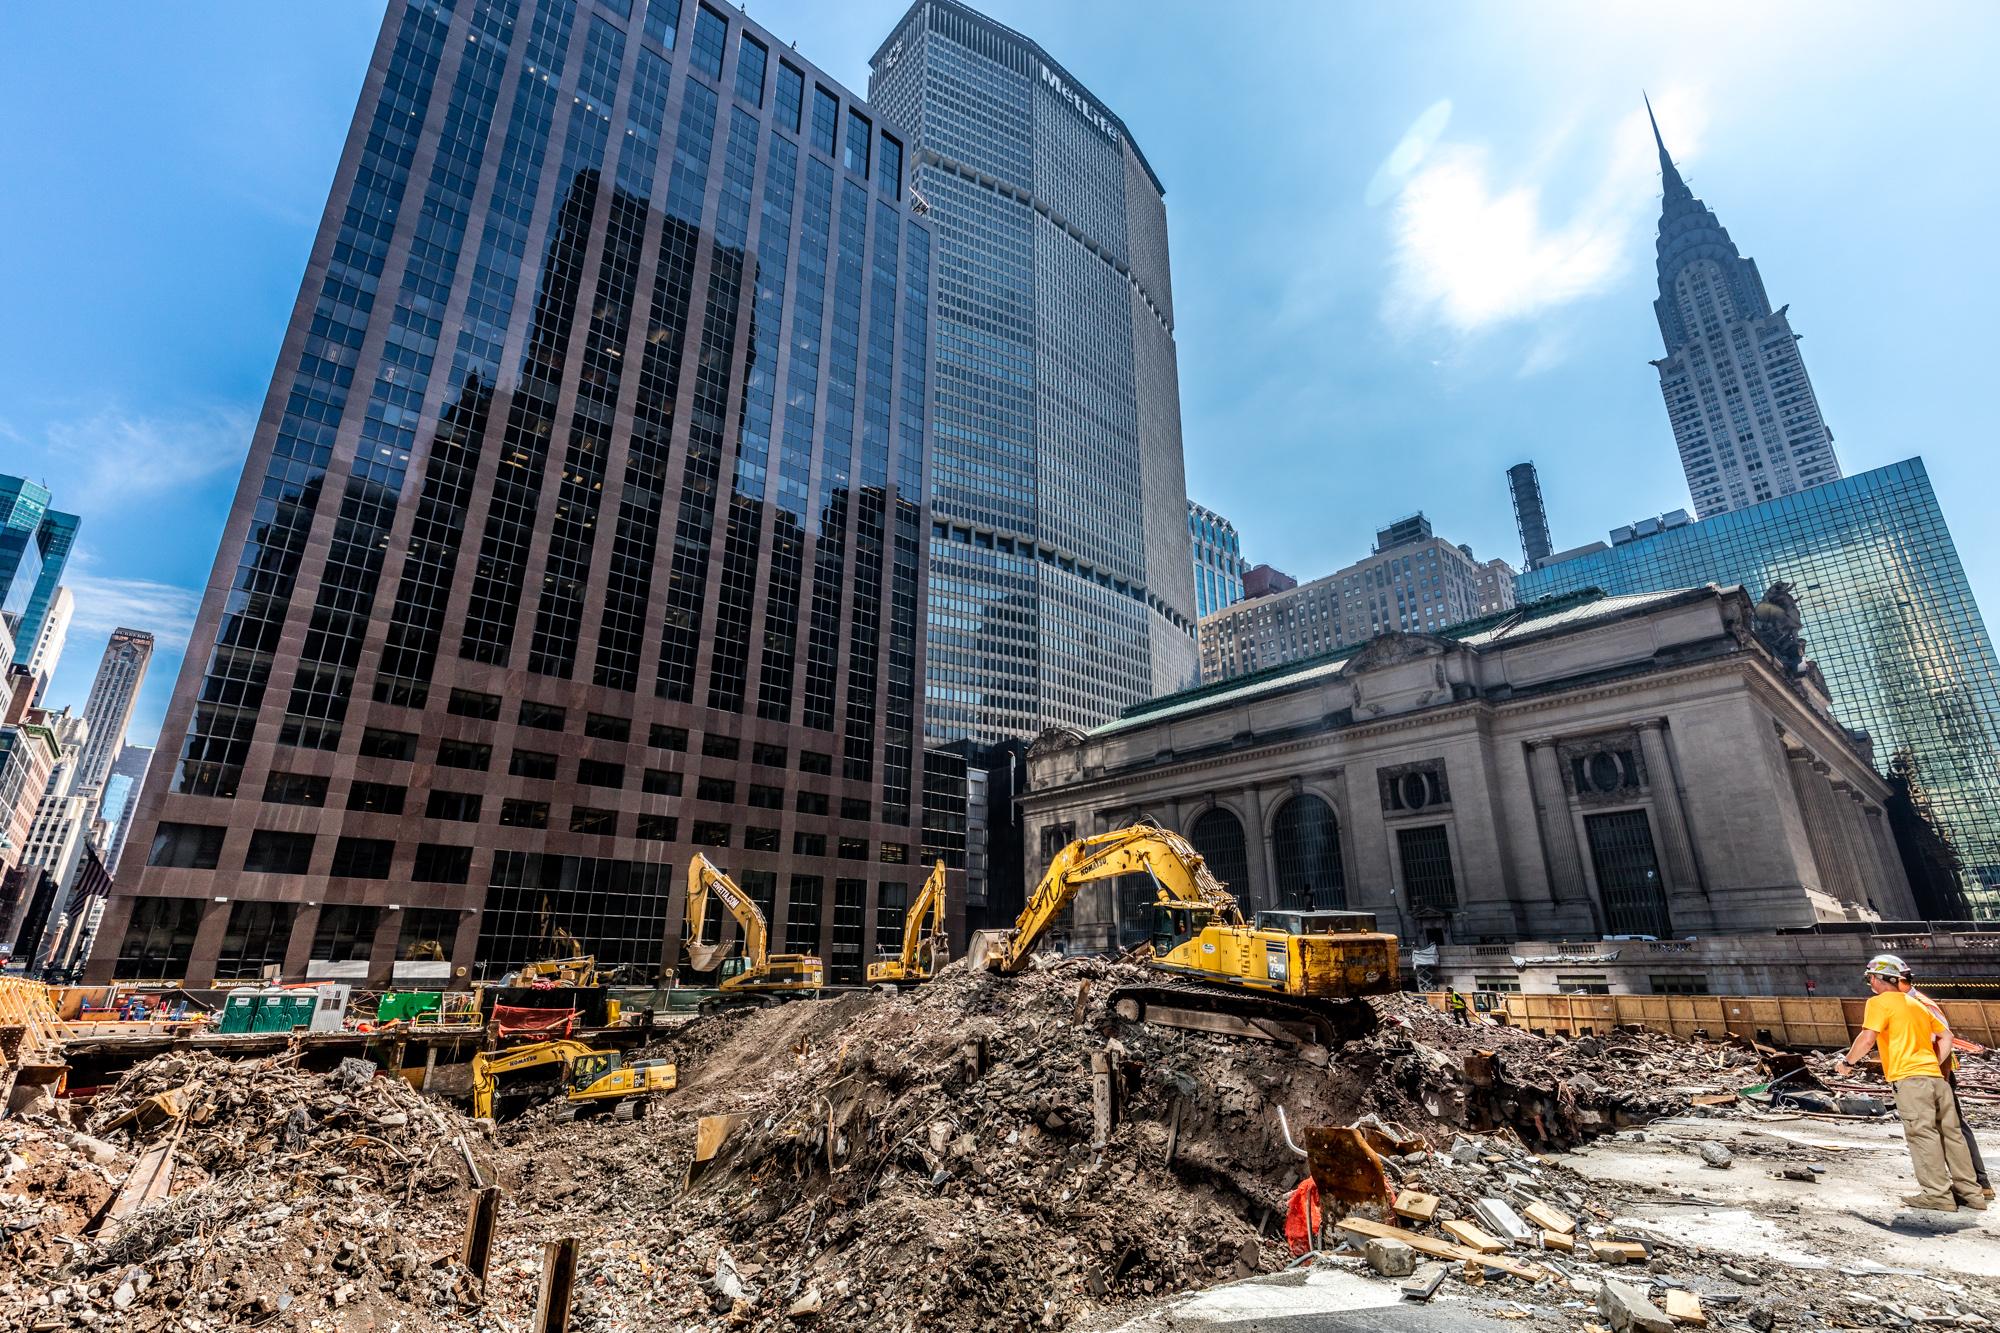 One Vanderbilt Construction - Max Touhey for SL Green